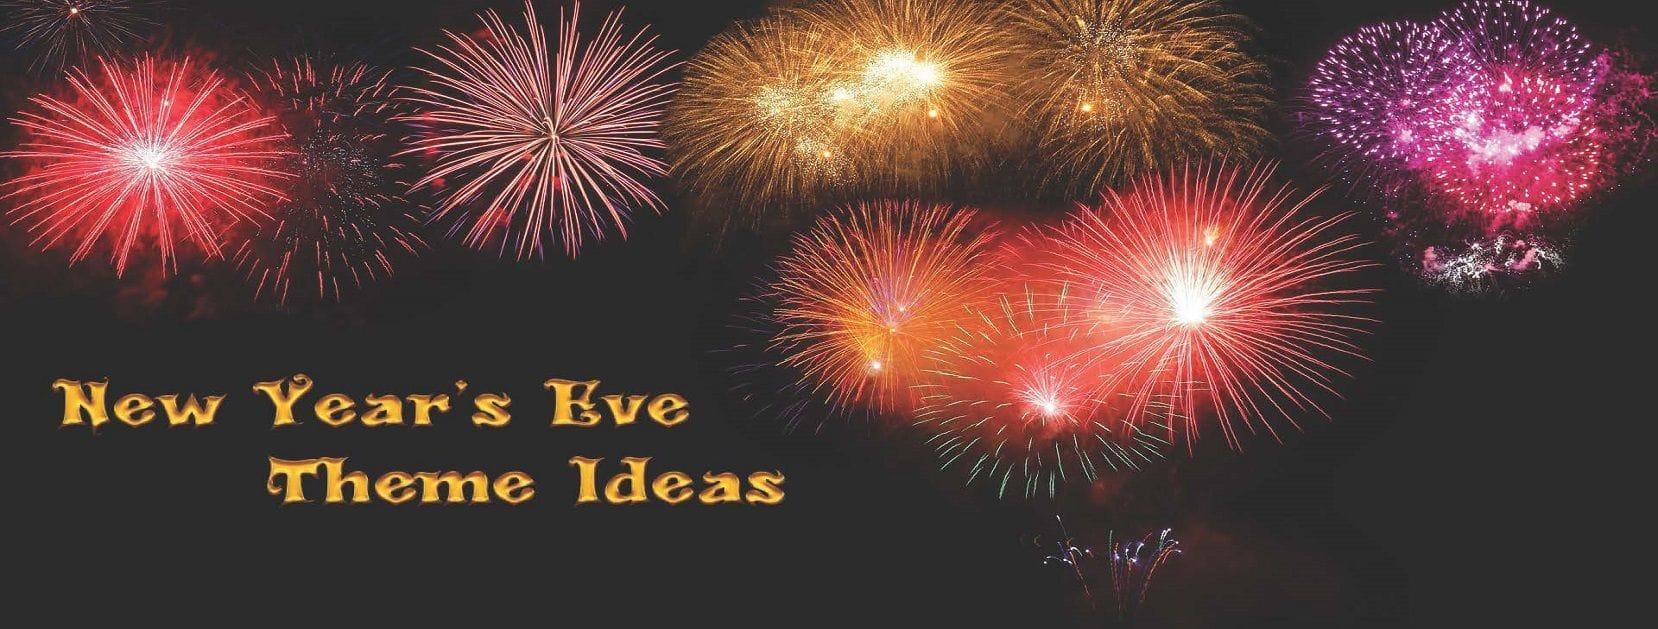 new years eve theme ideas